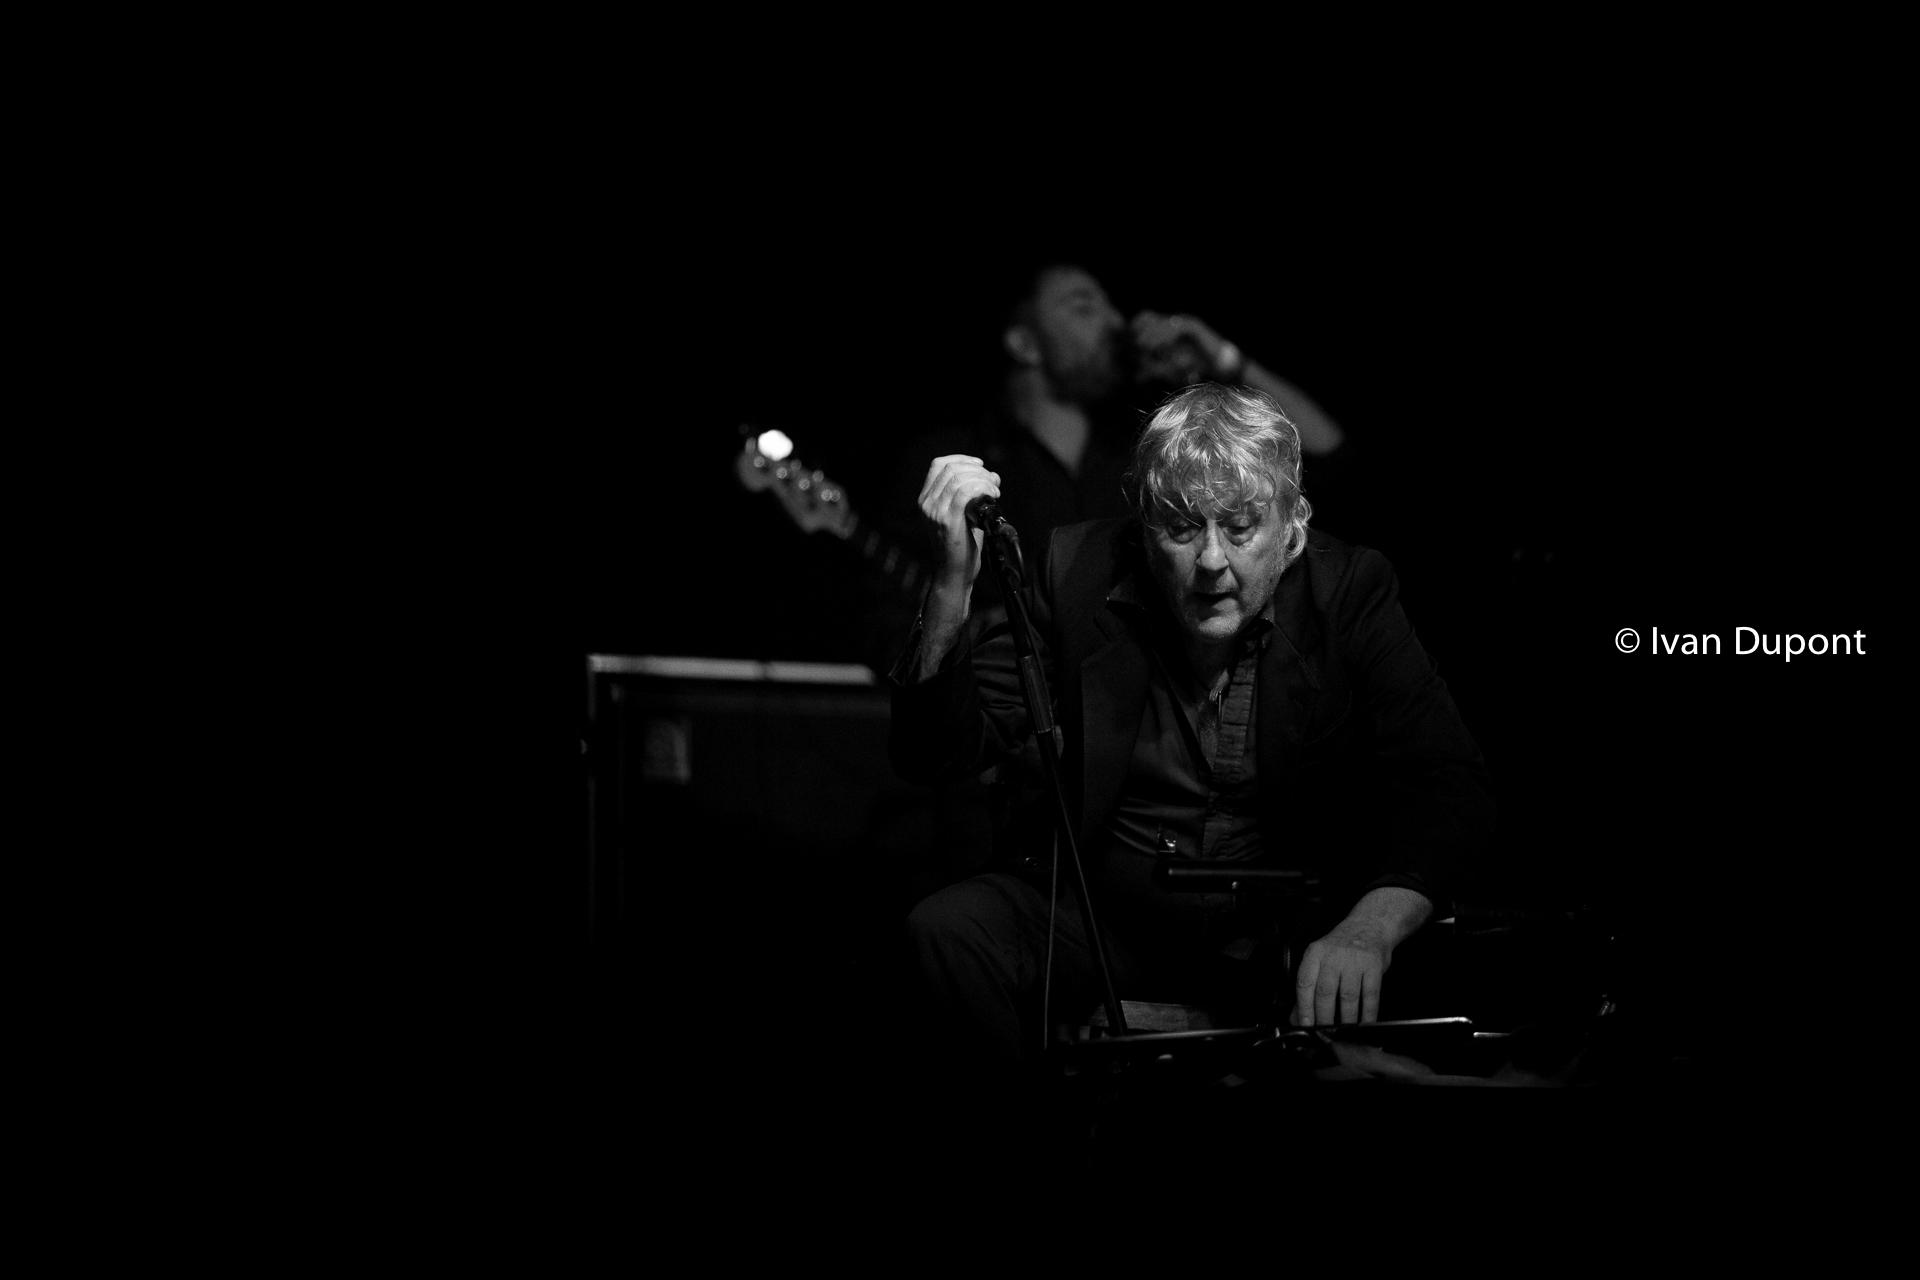 Arno 2014 by Ivan Dupont